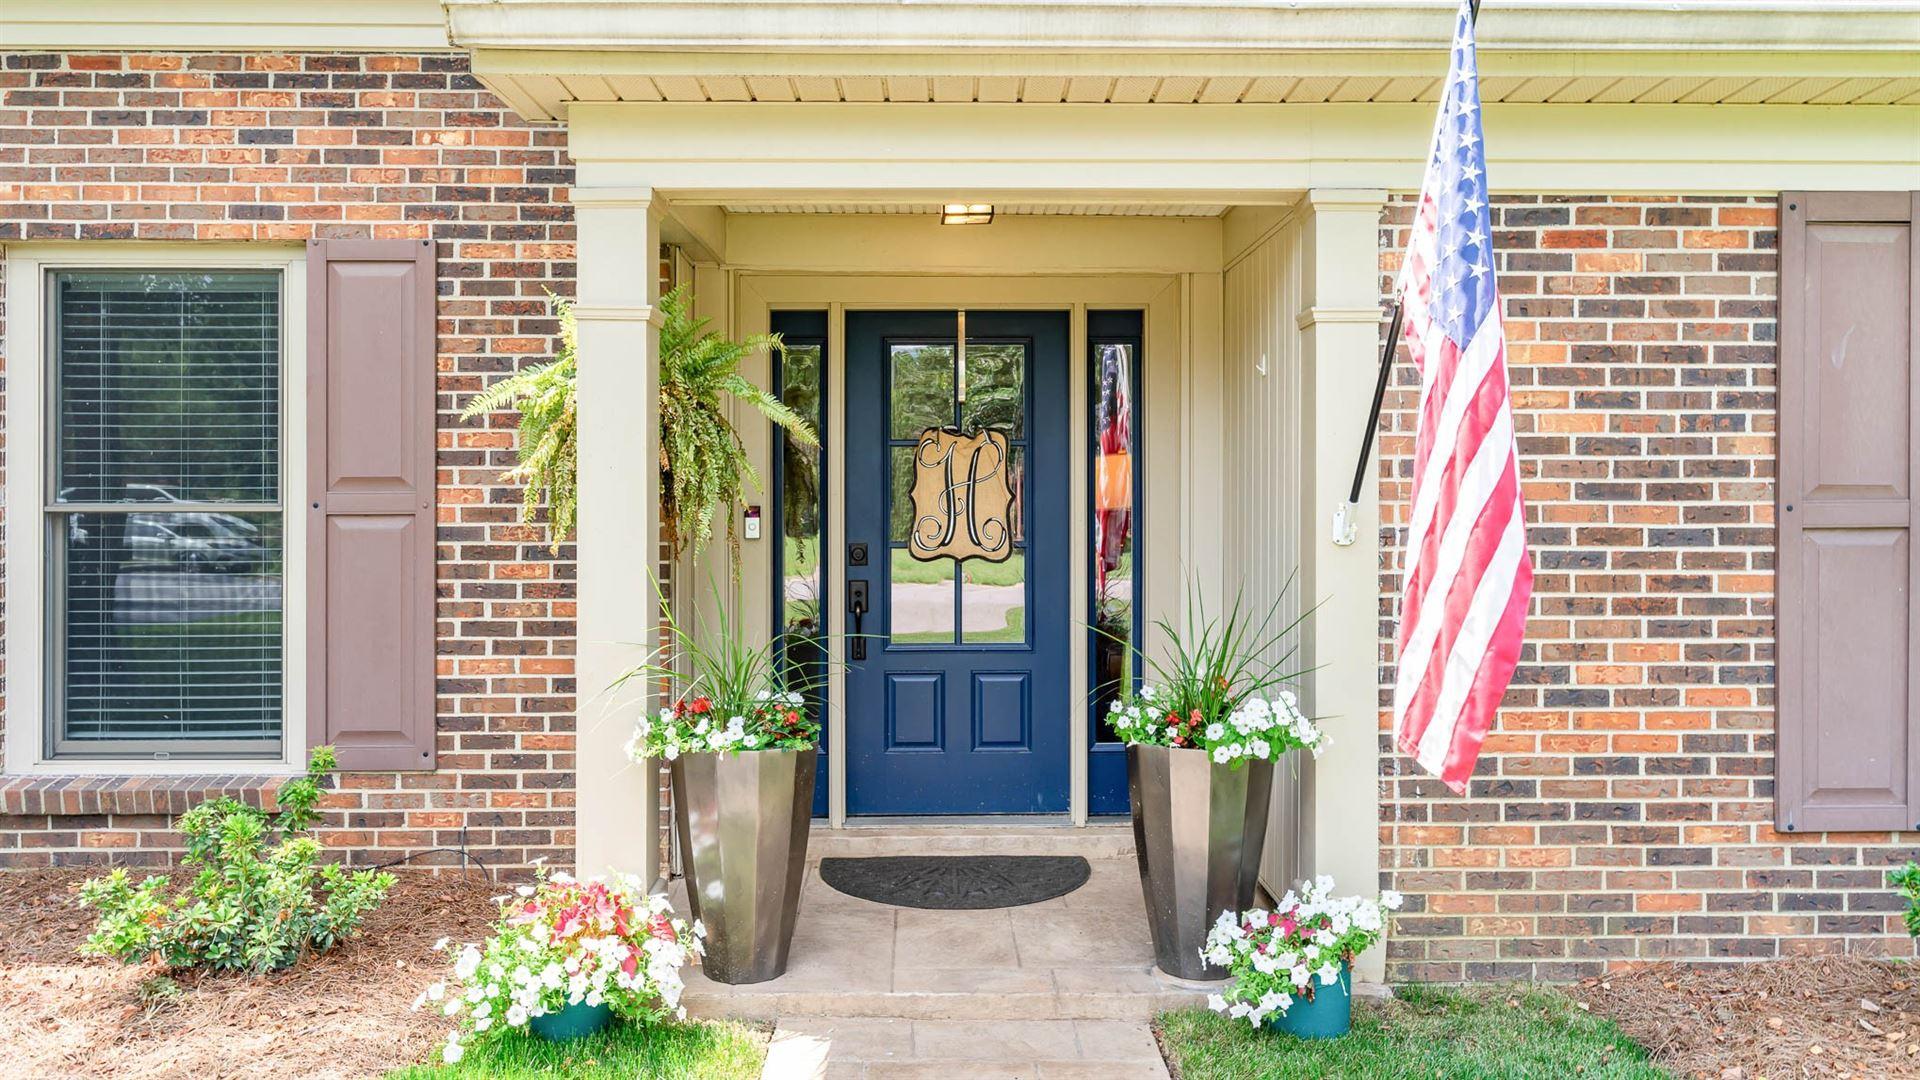 Photo of 1809 Blue Springs Ct, Franklin, TN 37069 (MLS # 2272591)